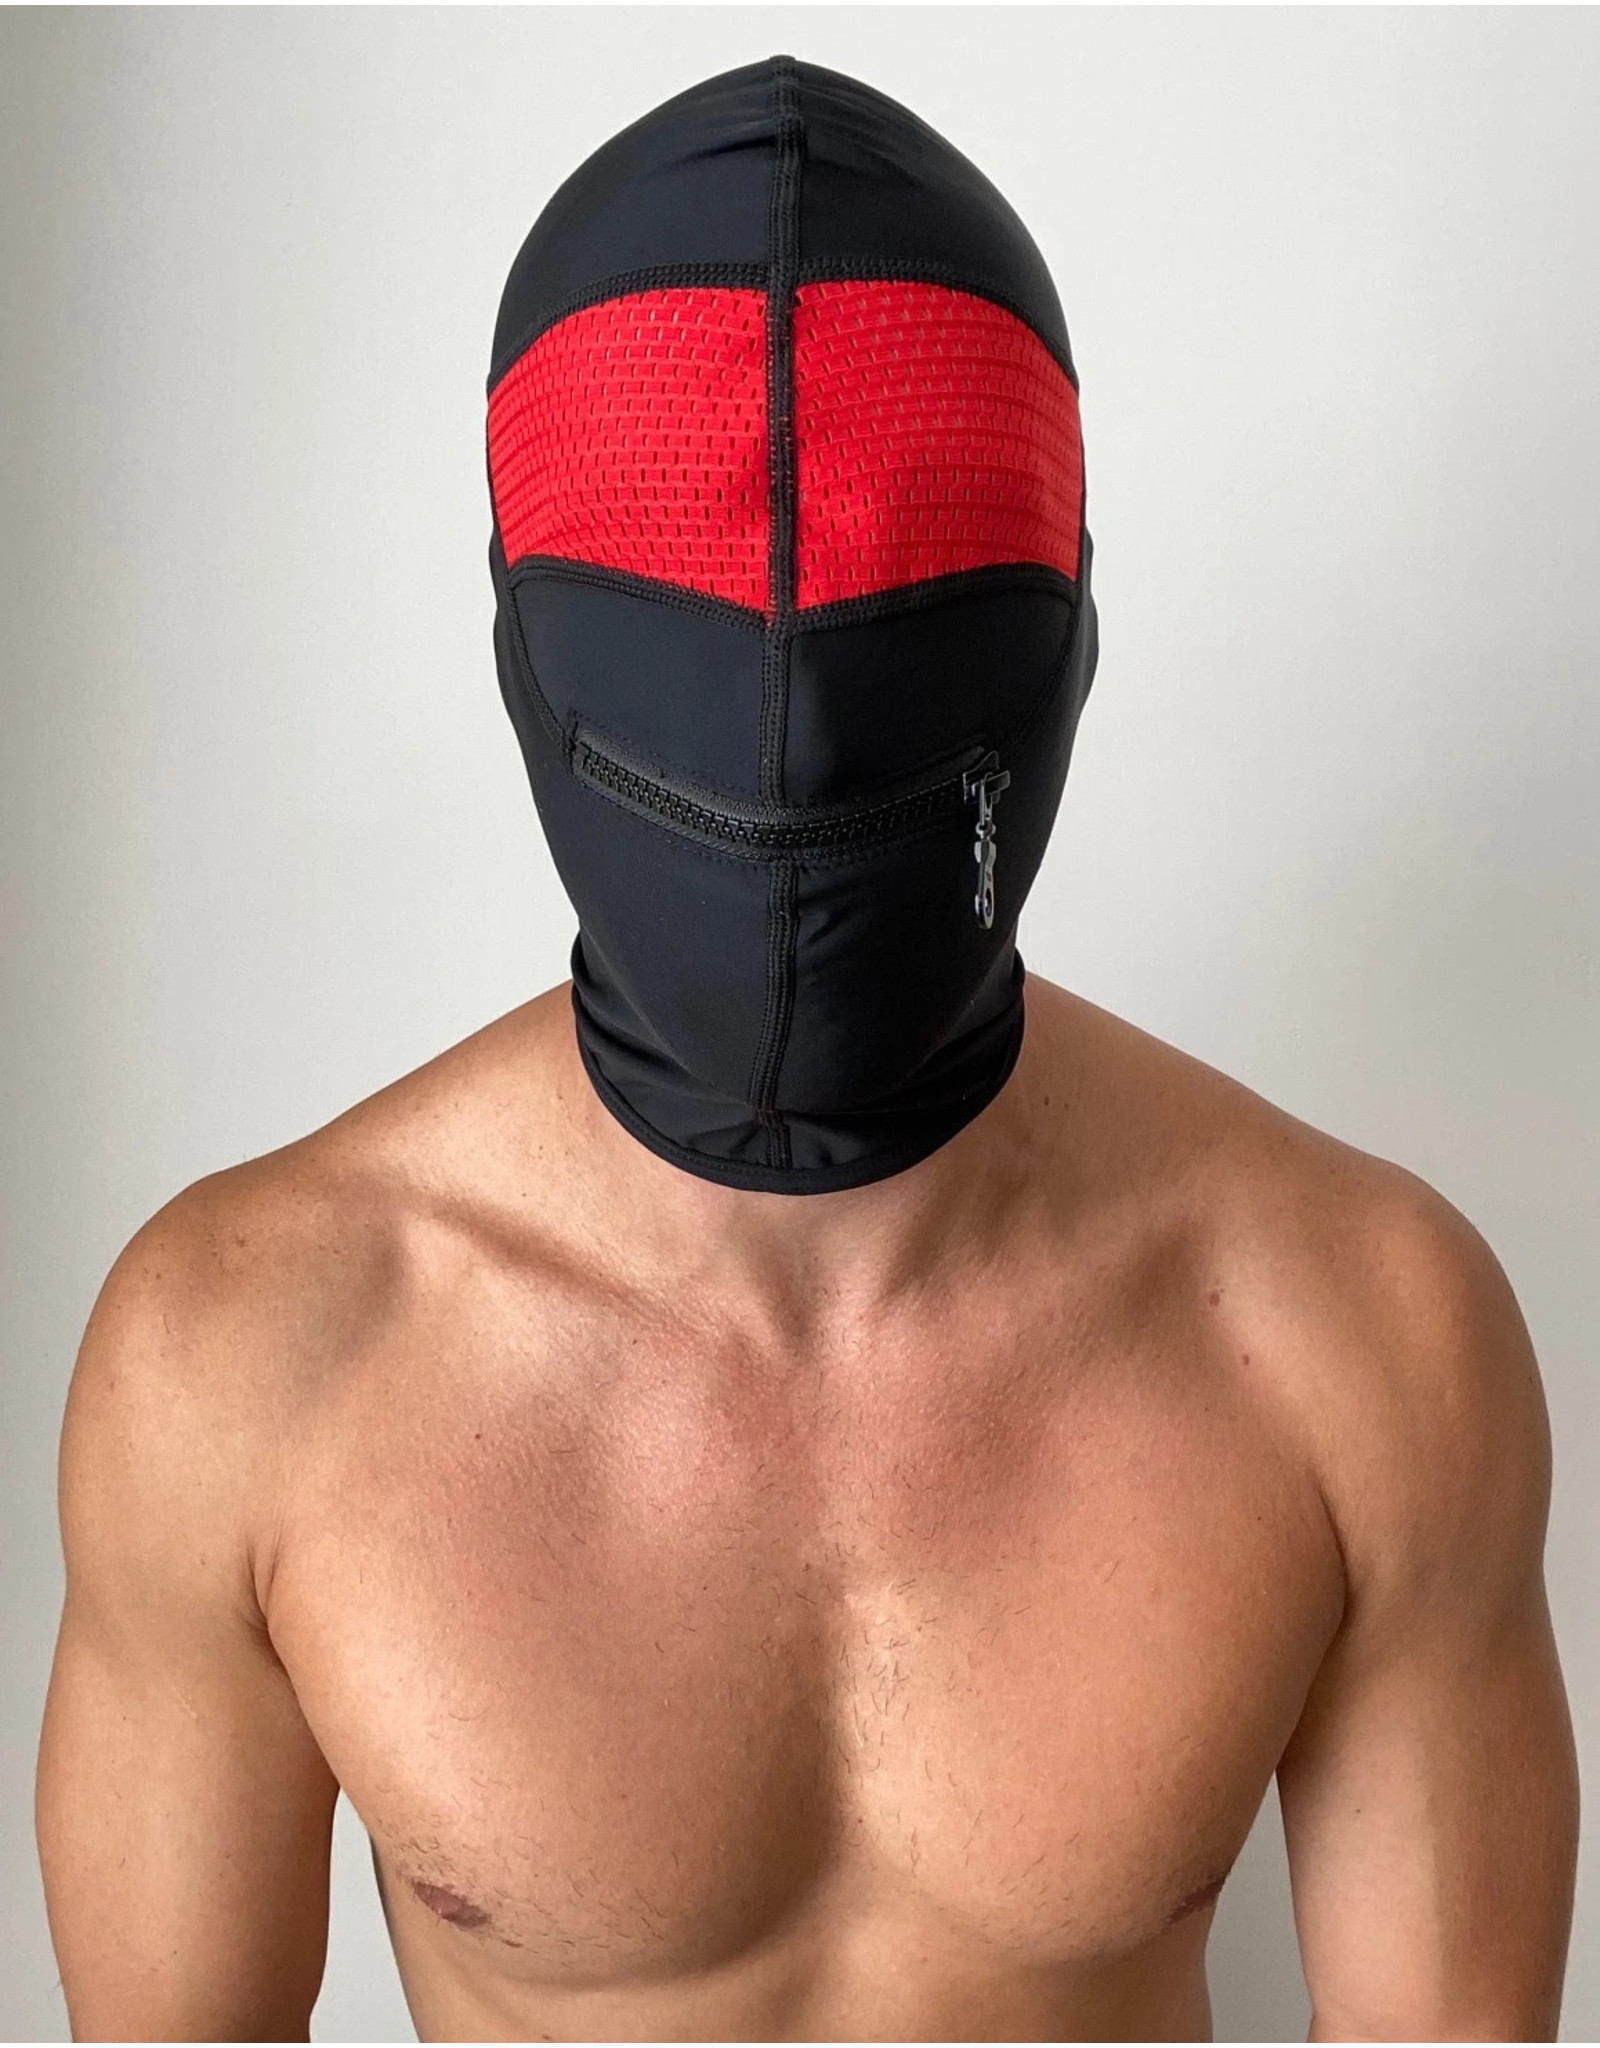 Cellblock13 Cellblock13 Bandit Hood